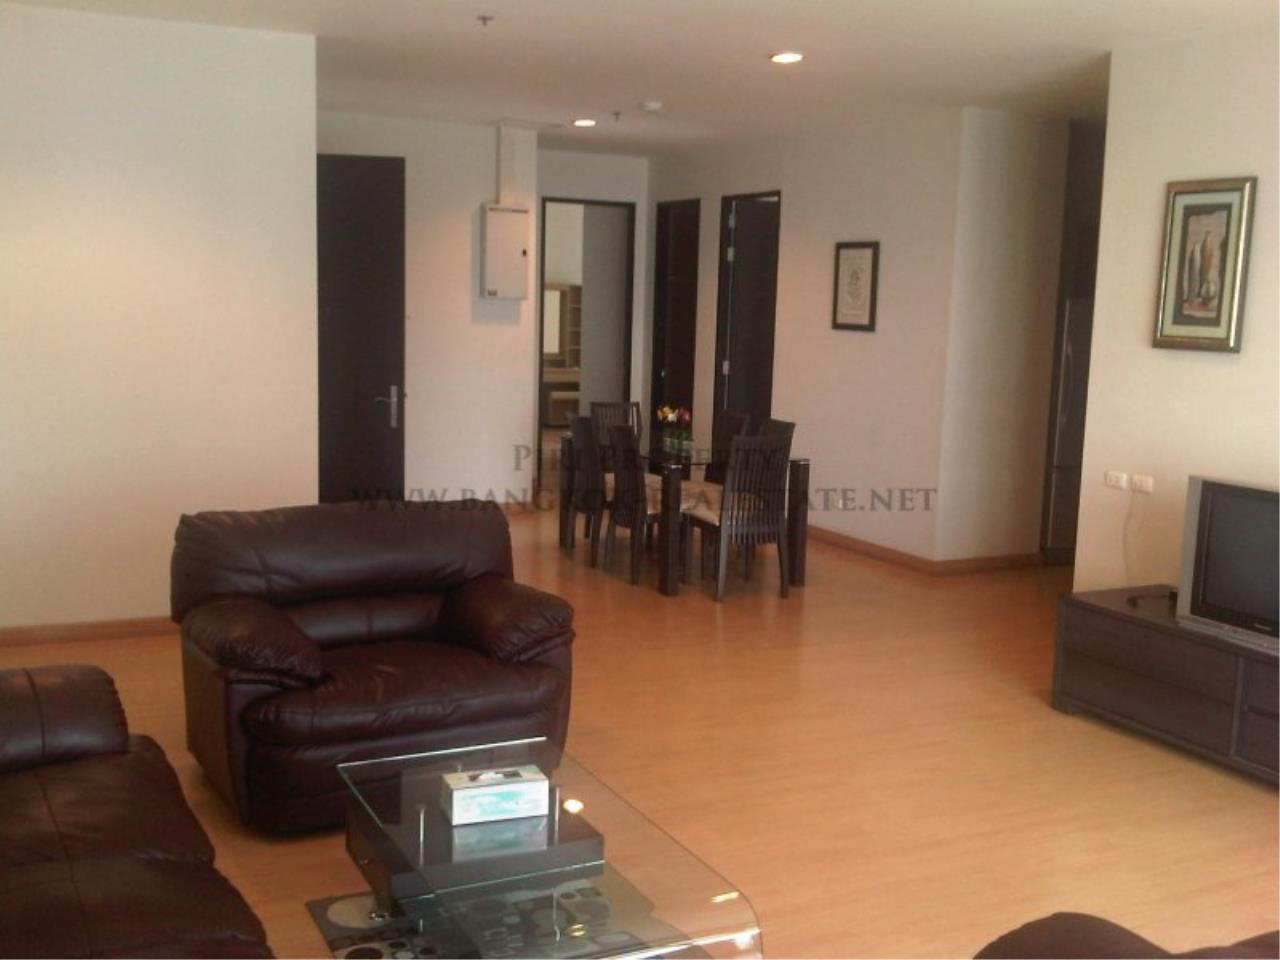 Piri Property Agency's 3 Bedroom Penthouse Unit - AP Citismart for Rent 1